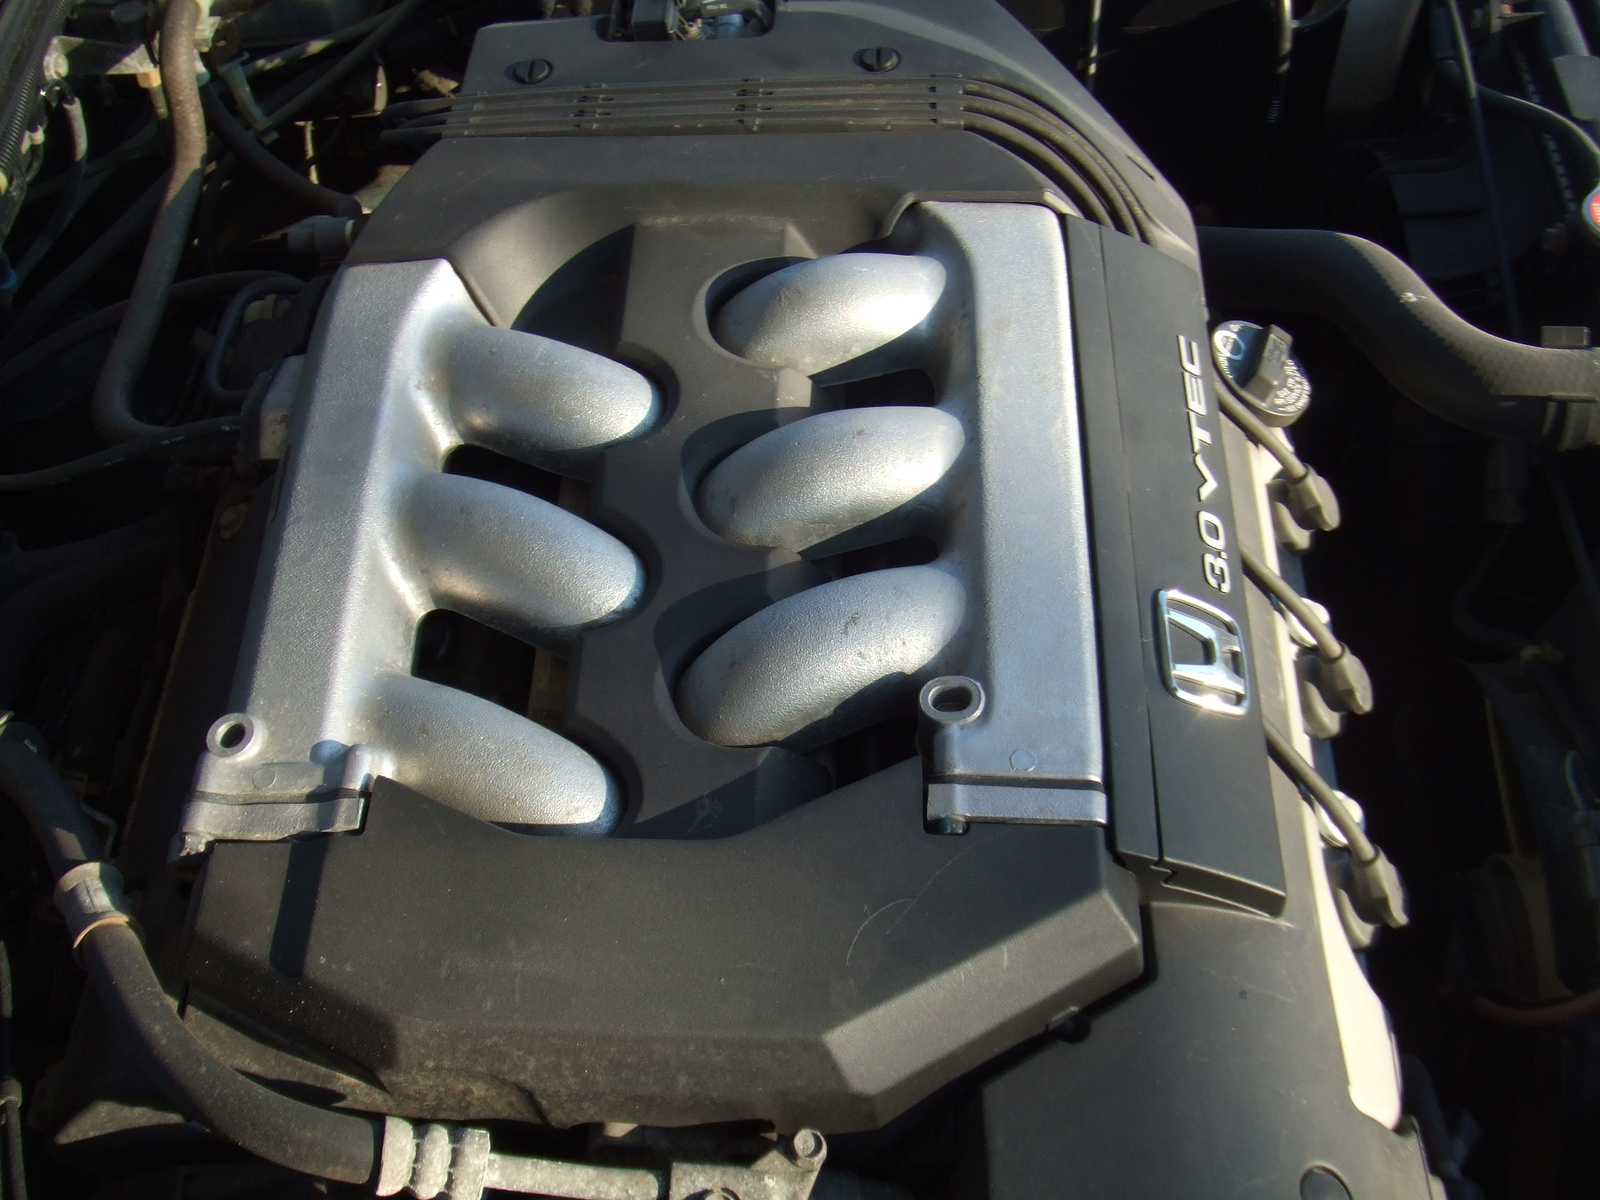 1998 Honda Accord EX V6, 1998 Honda Accord 4 Dr EX V6 Sedan picture, engine